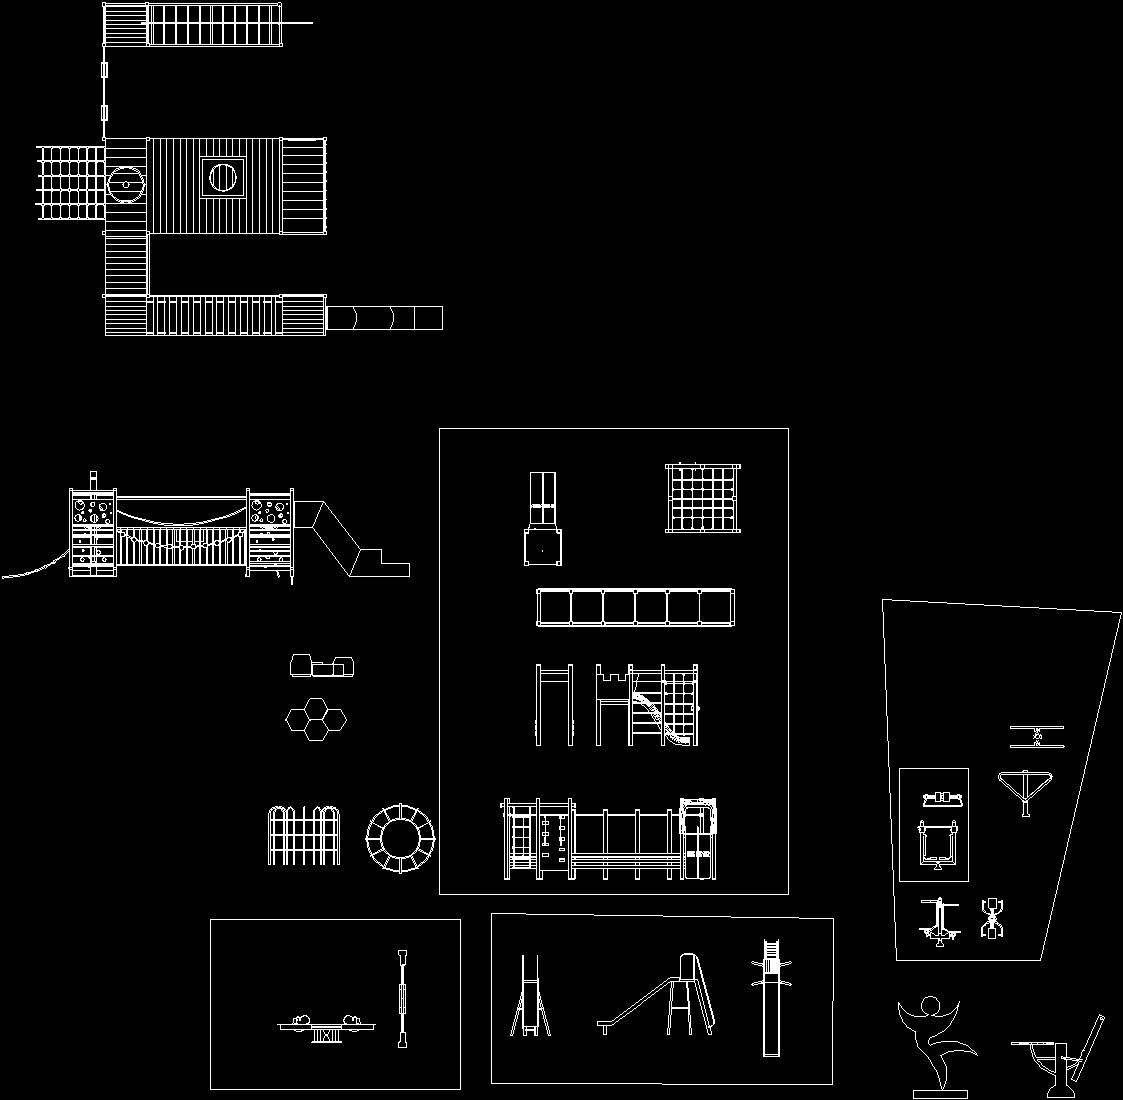 Playground Equipment Dwg Block For Autocad Designs Cad